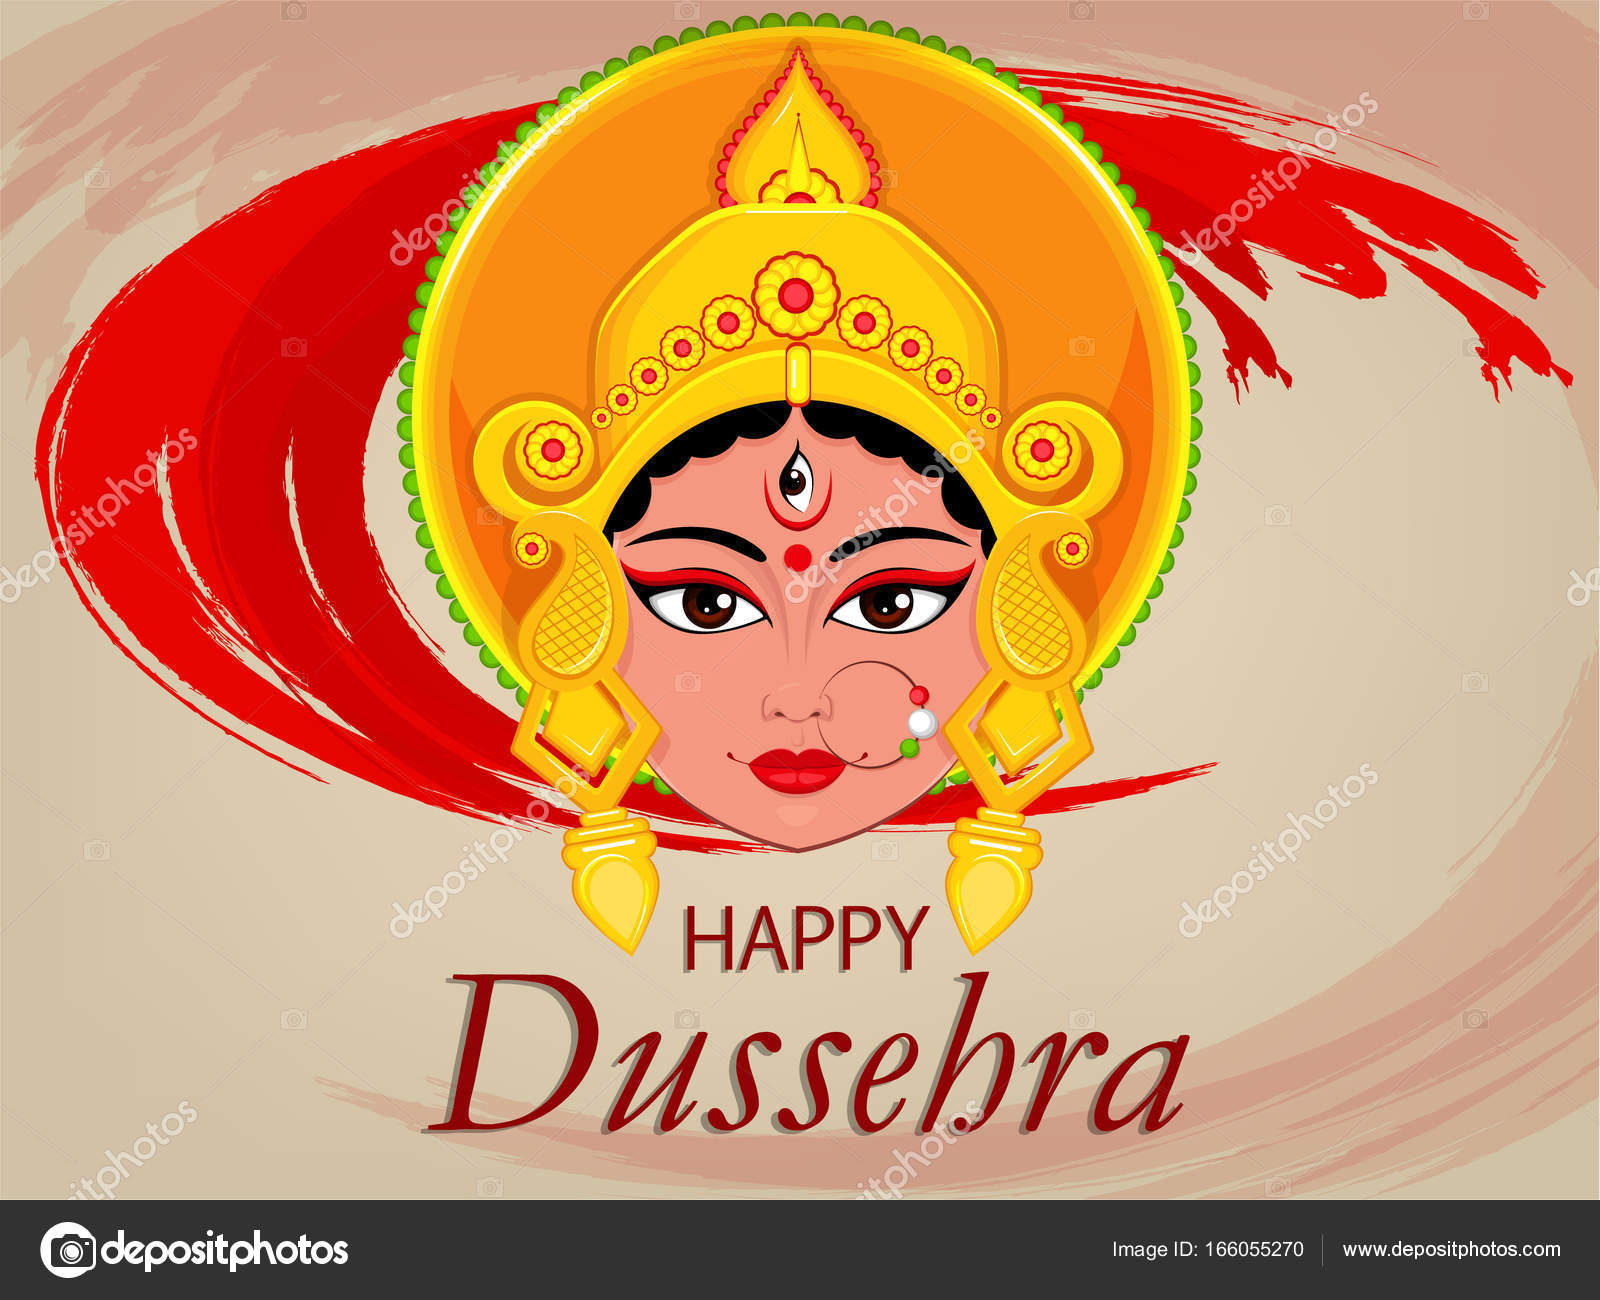 Happy dussehra greeting card maa durga face for hindu festival happy dussehra greeting card maa durga face for hindu festival stock vector kristyandbryce Choice Image